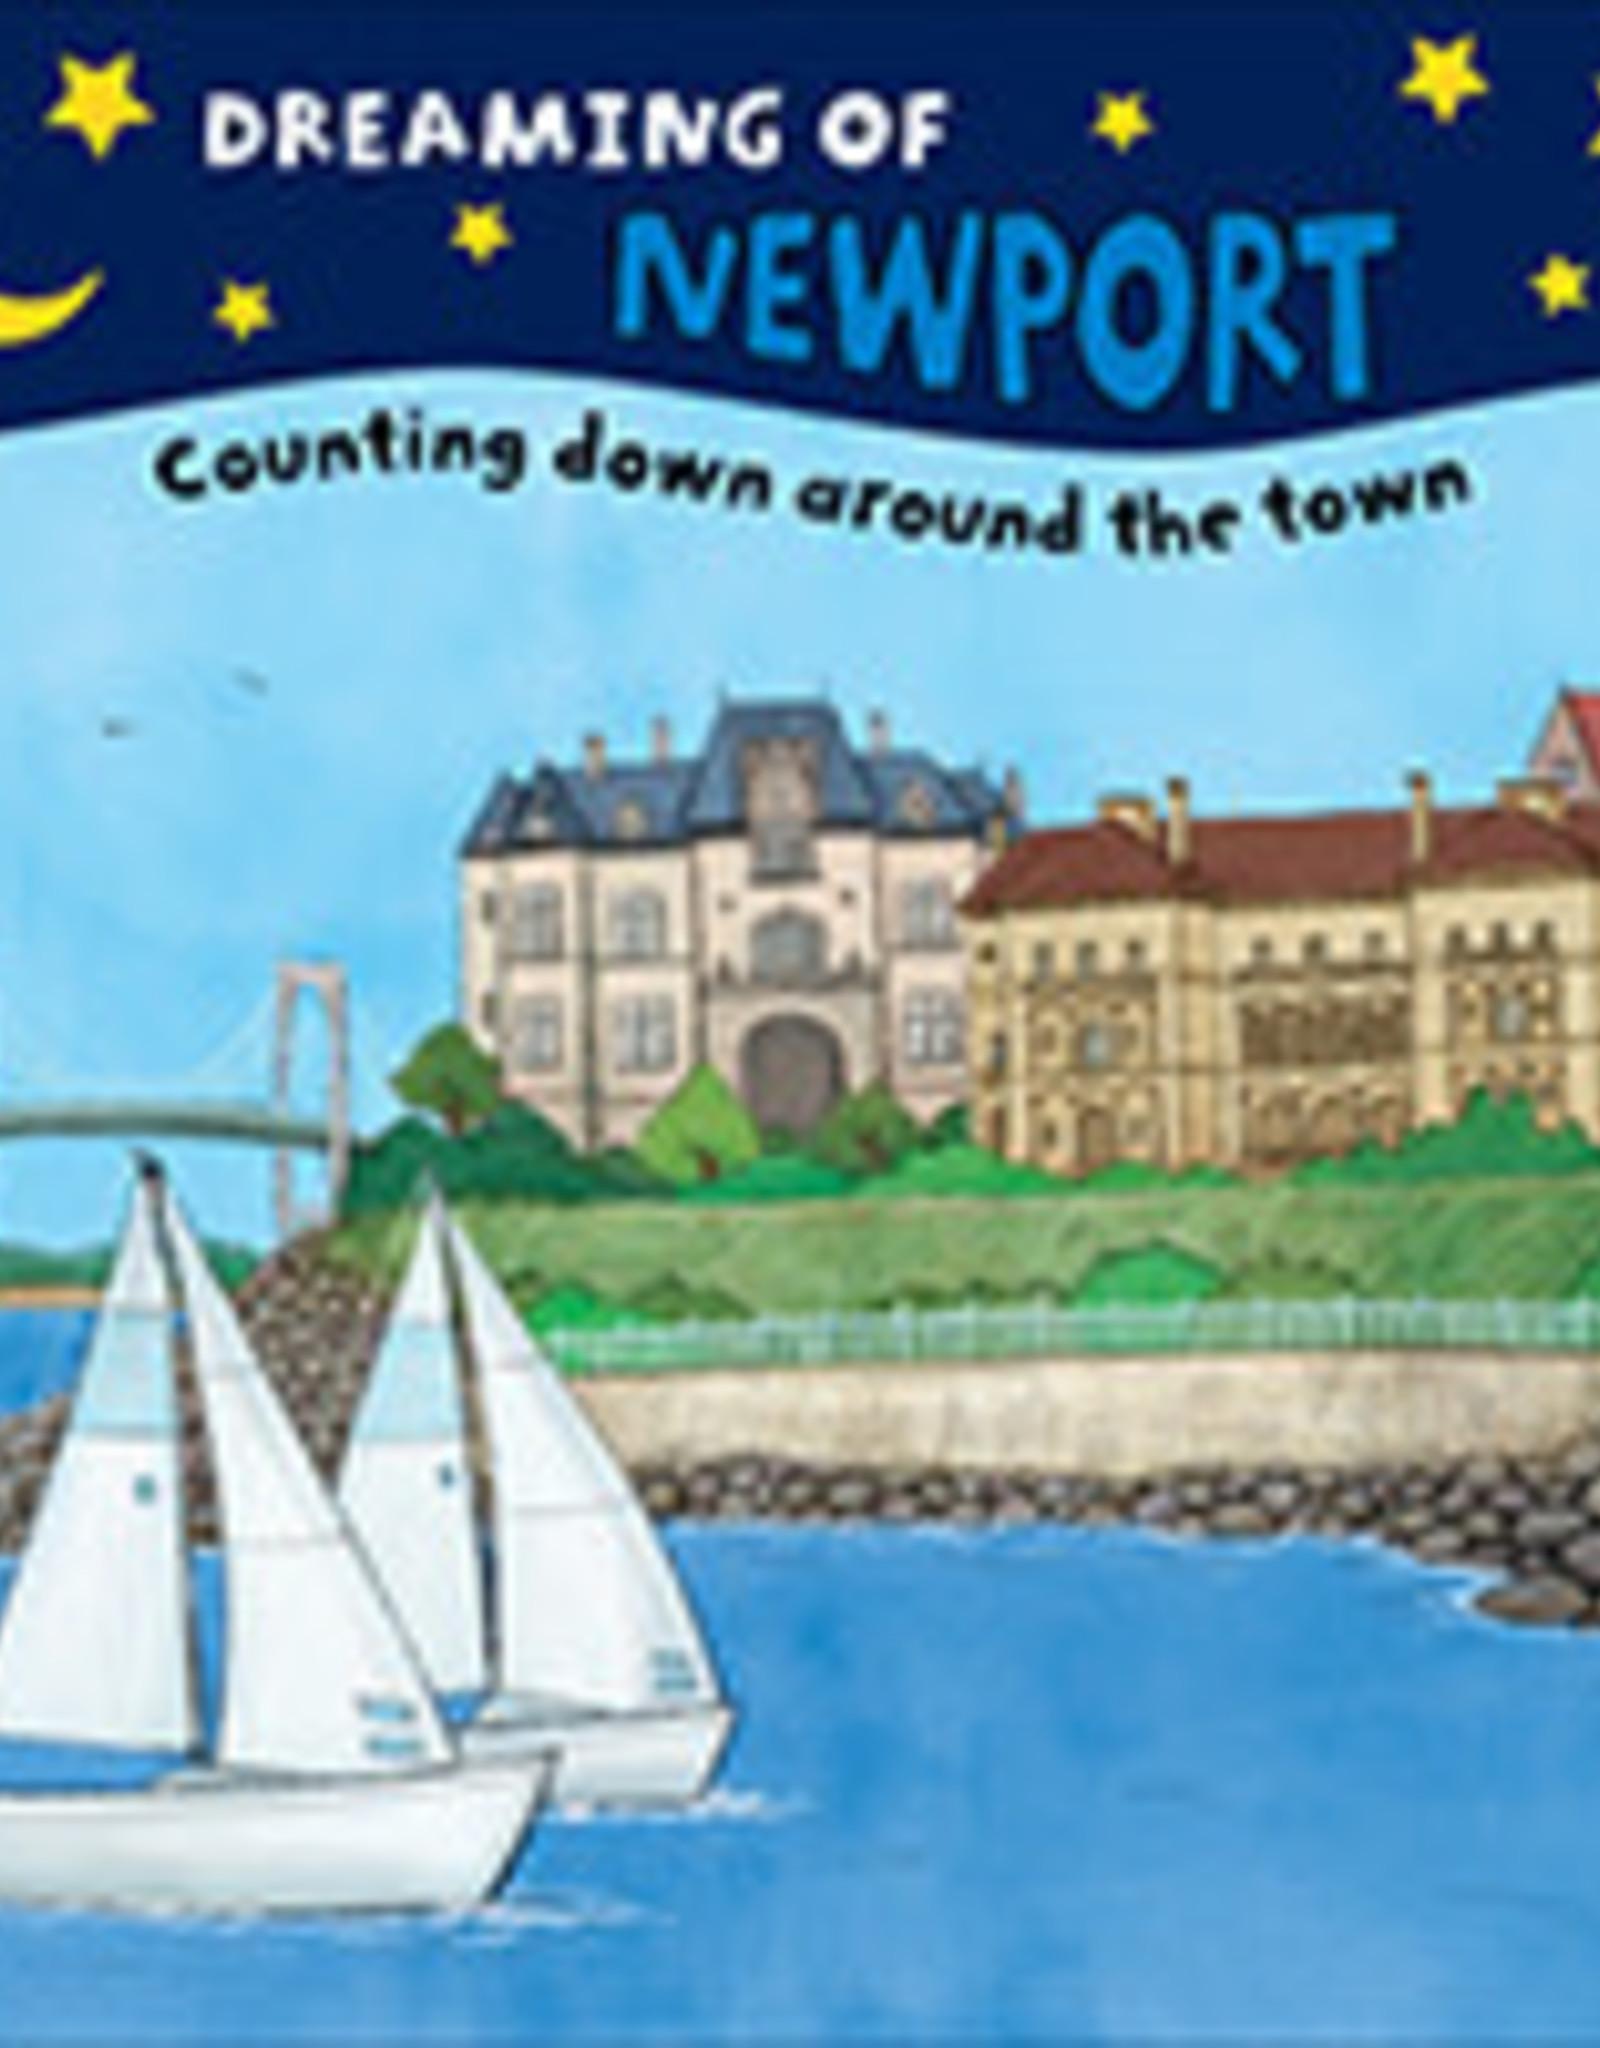 Dreaming of Newport